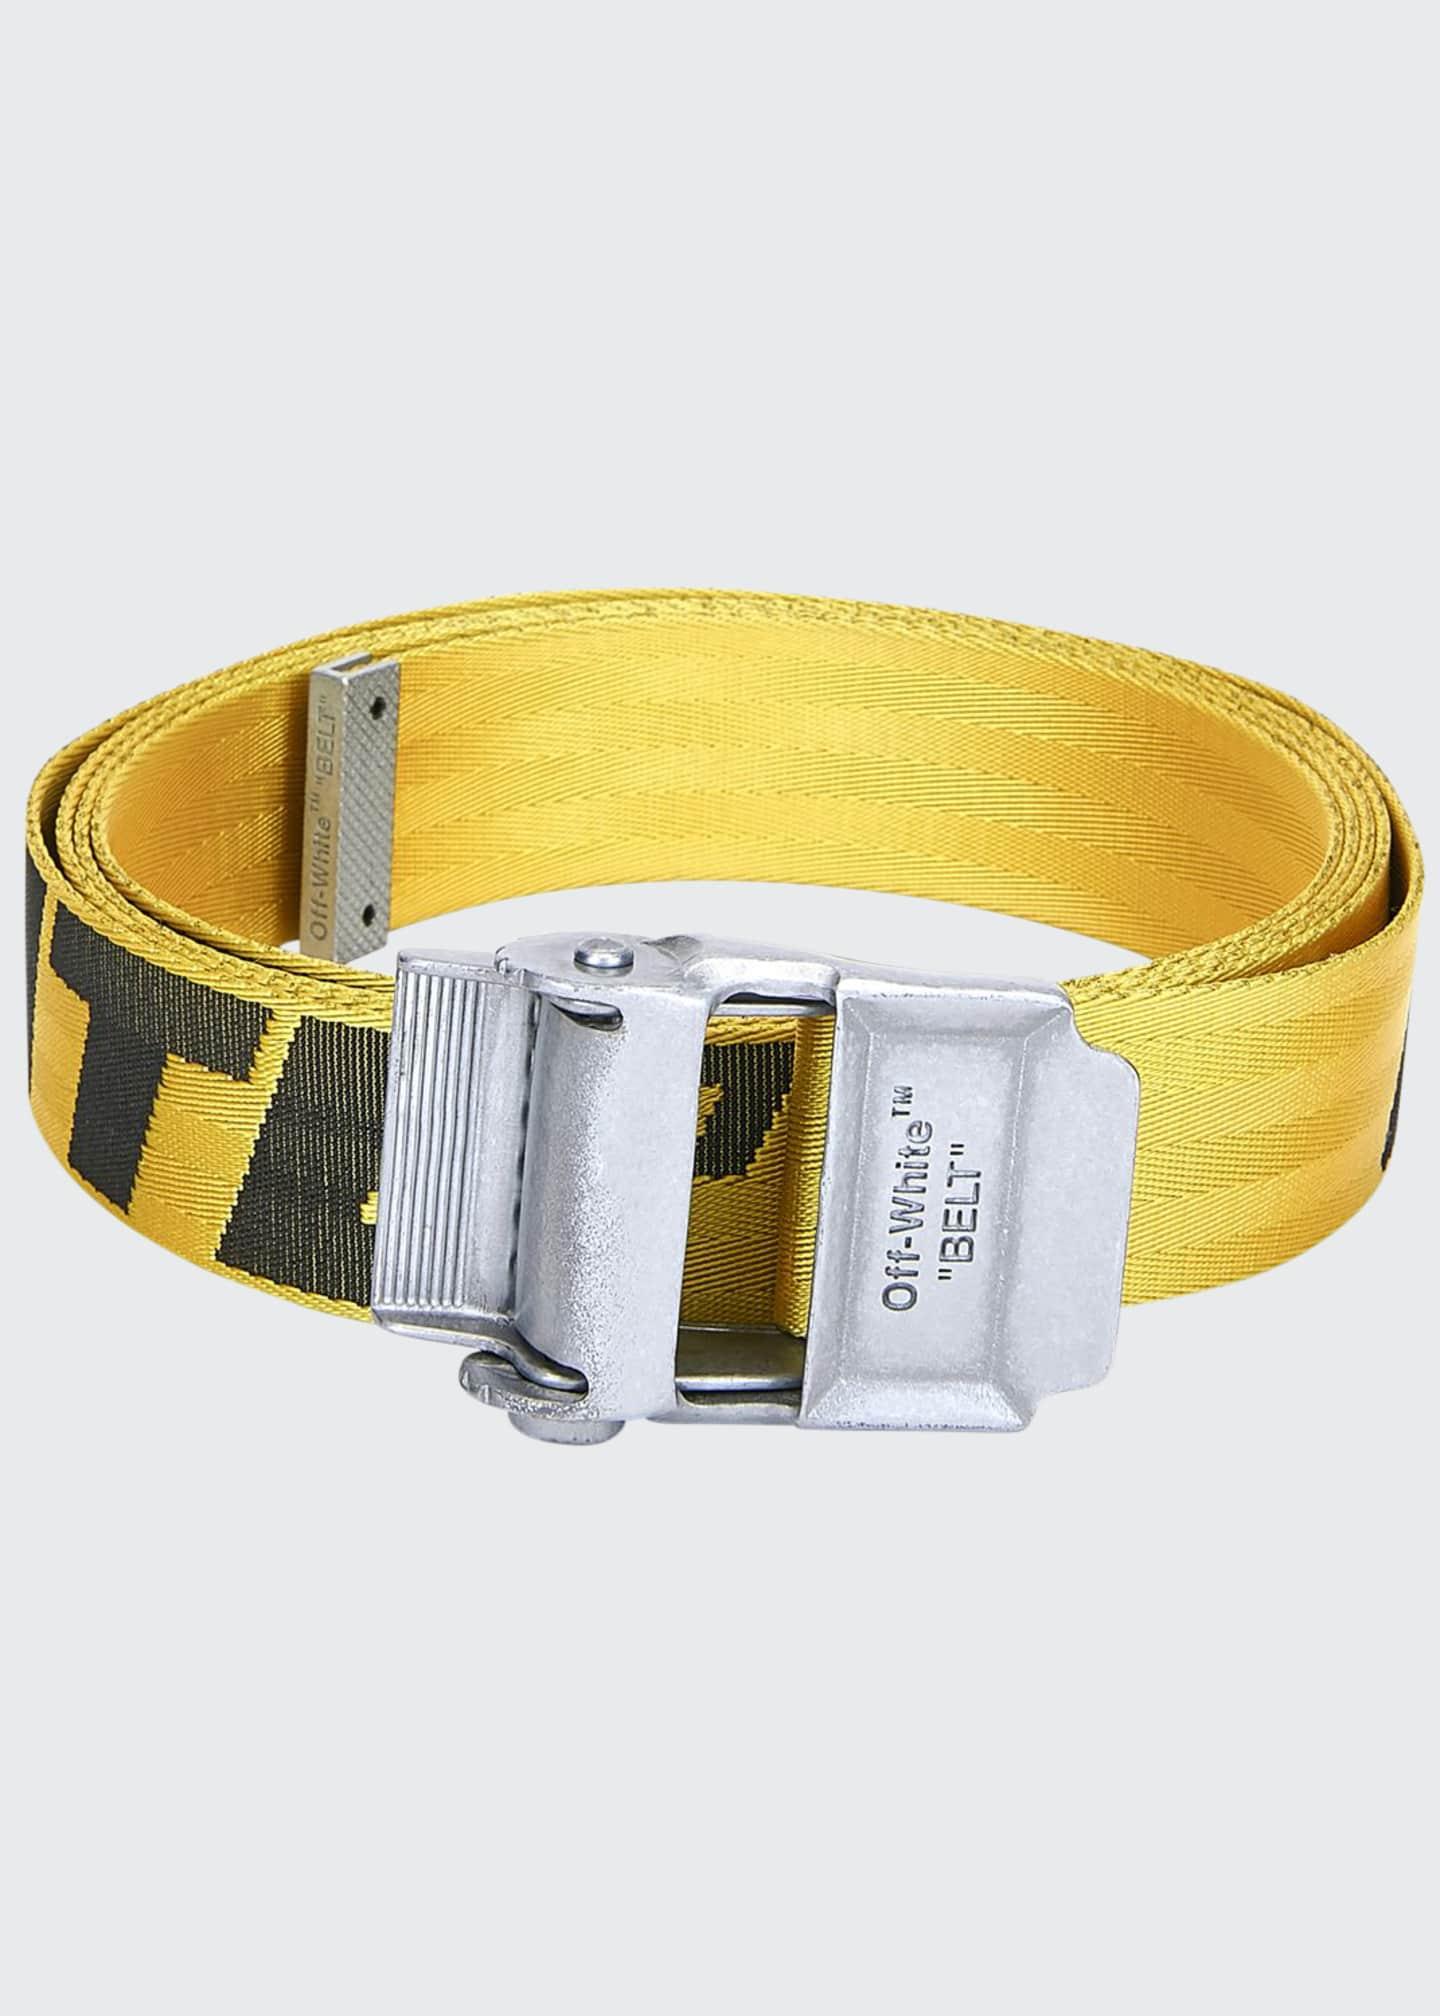 Off-White Men's Industrial Web Logo Belt, Yellow/Black - Bergdorf